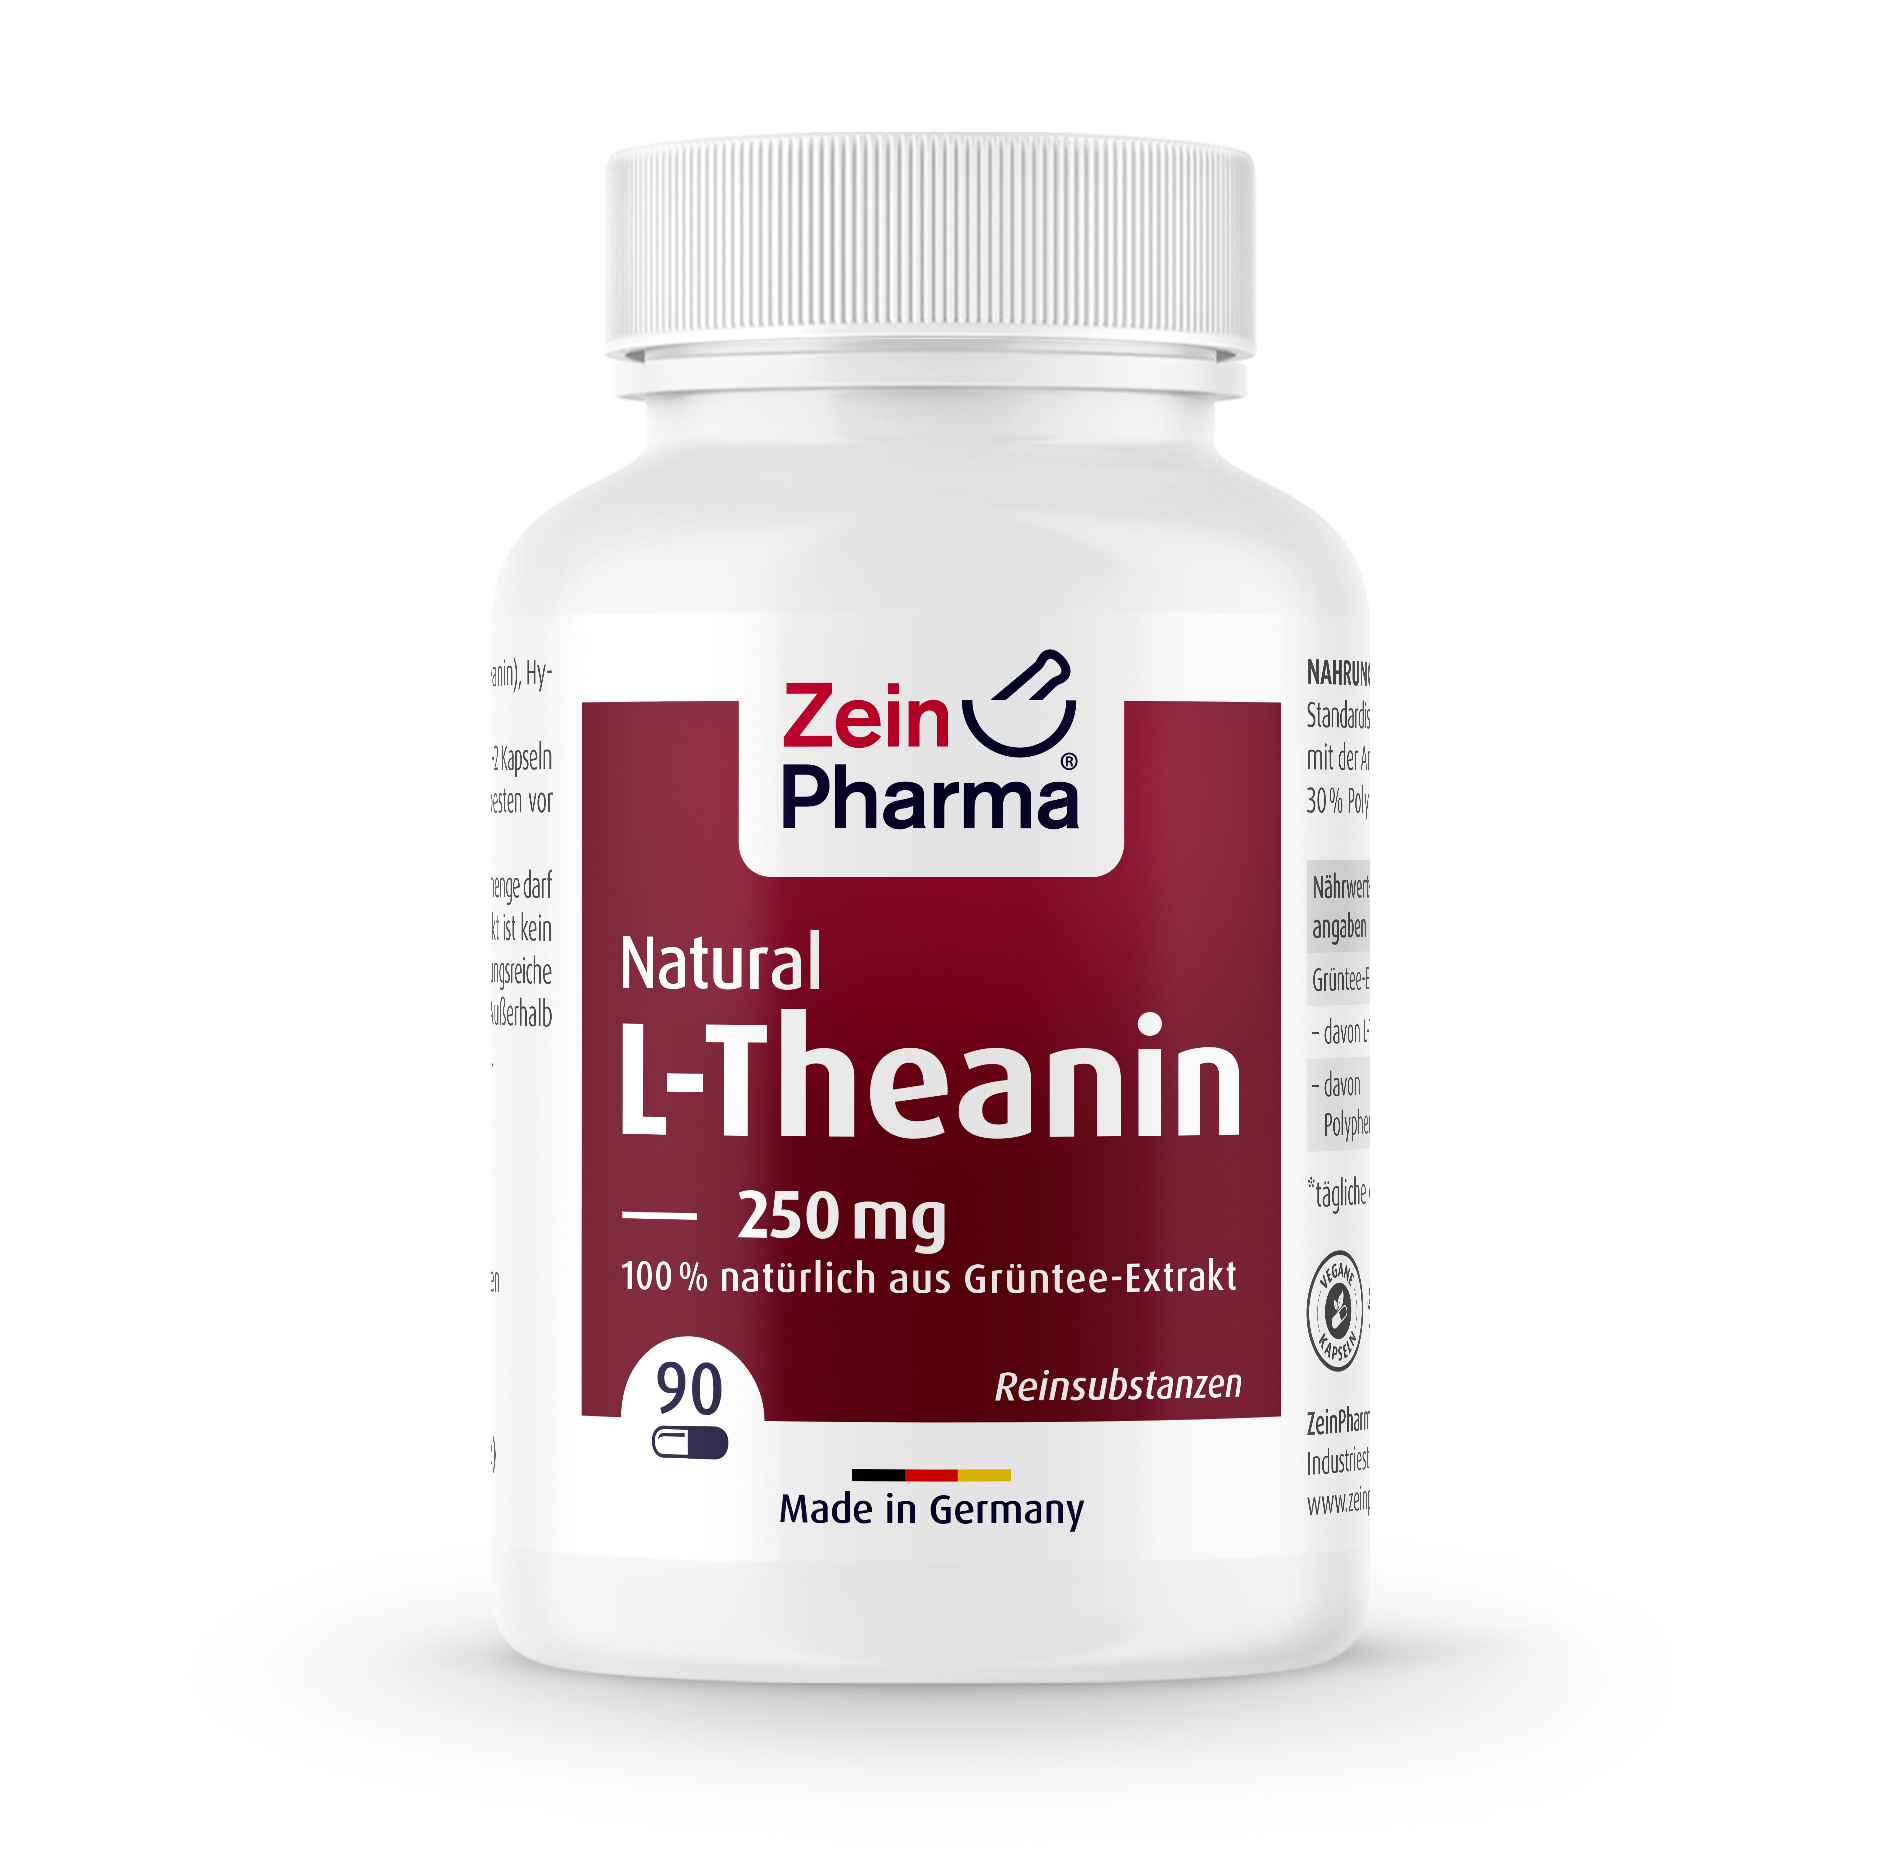 L-Theanin Natural Capsules 250 mg